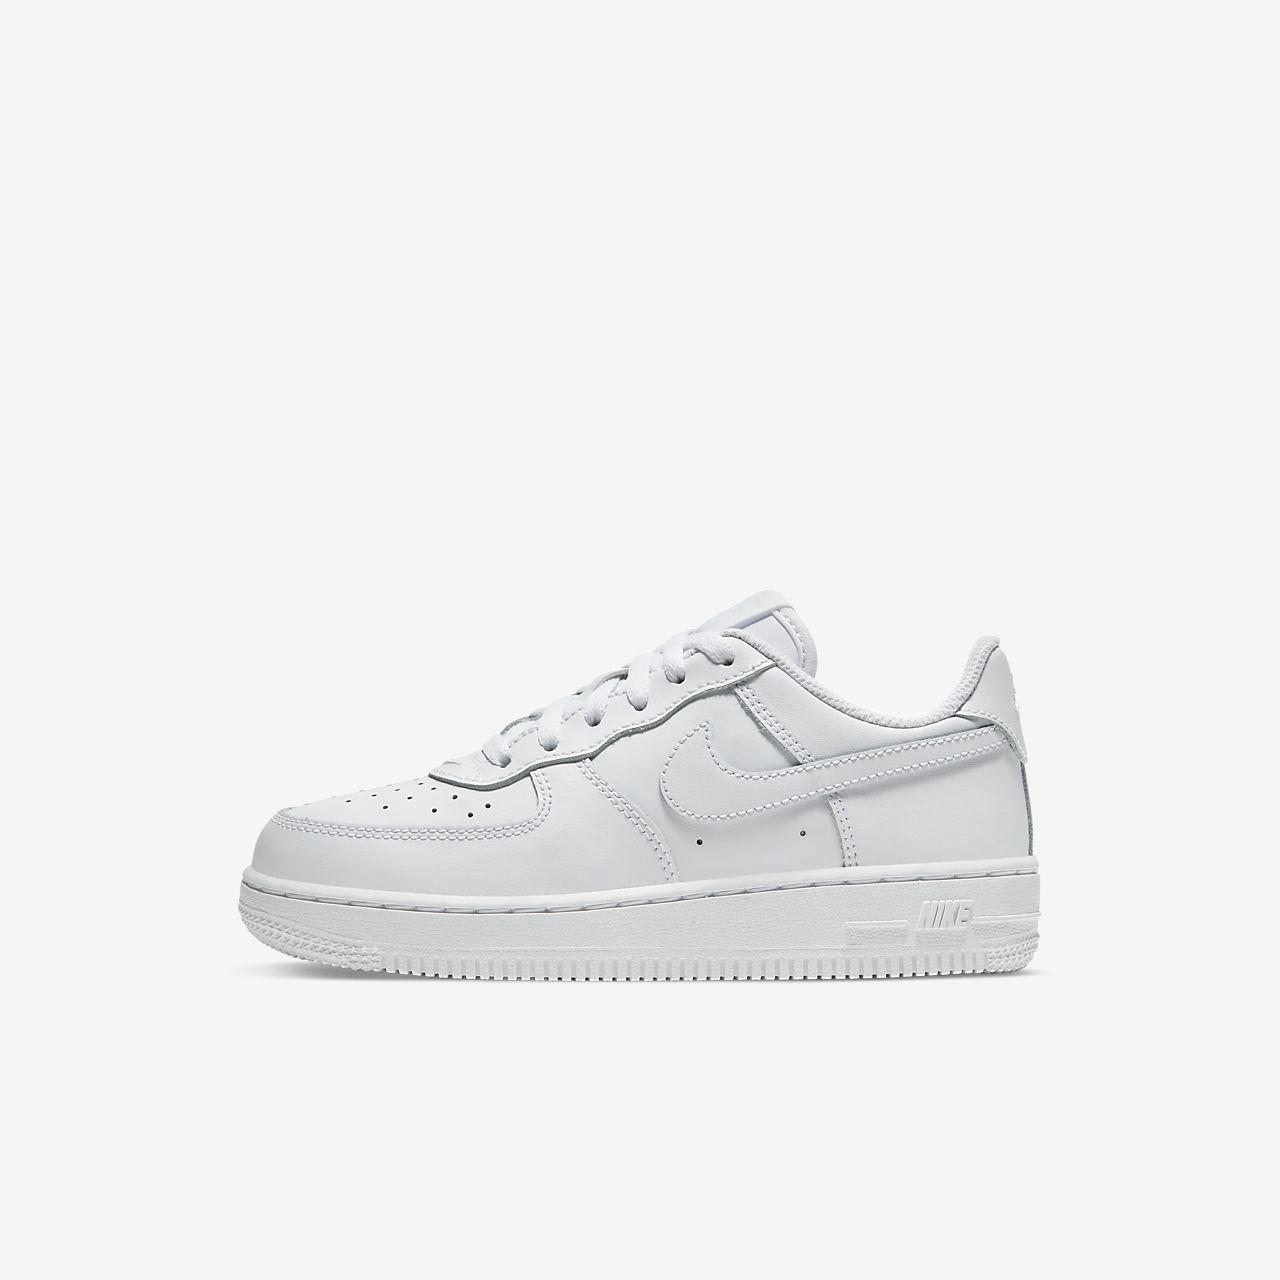 555bcba41a8b1 Chaussure Nike Force 1 pour Jeune enfant. Nike.com FR